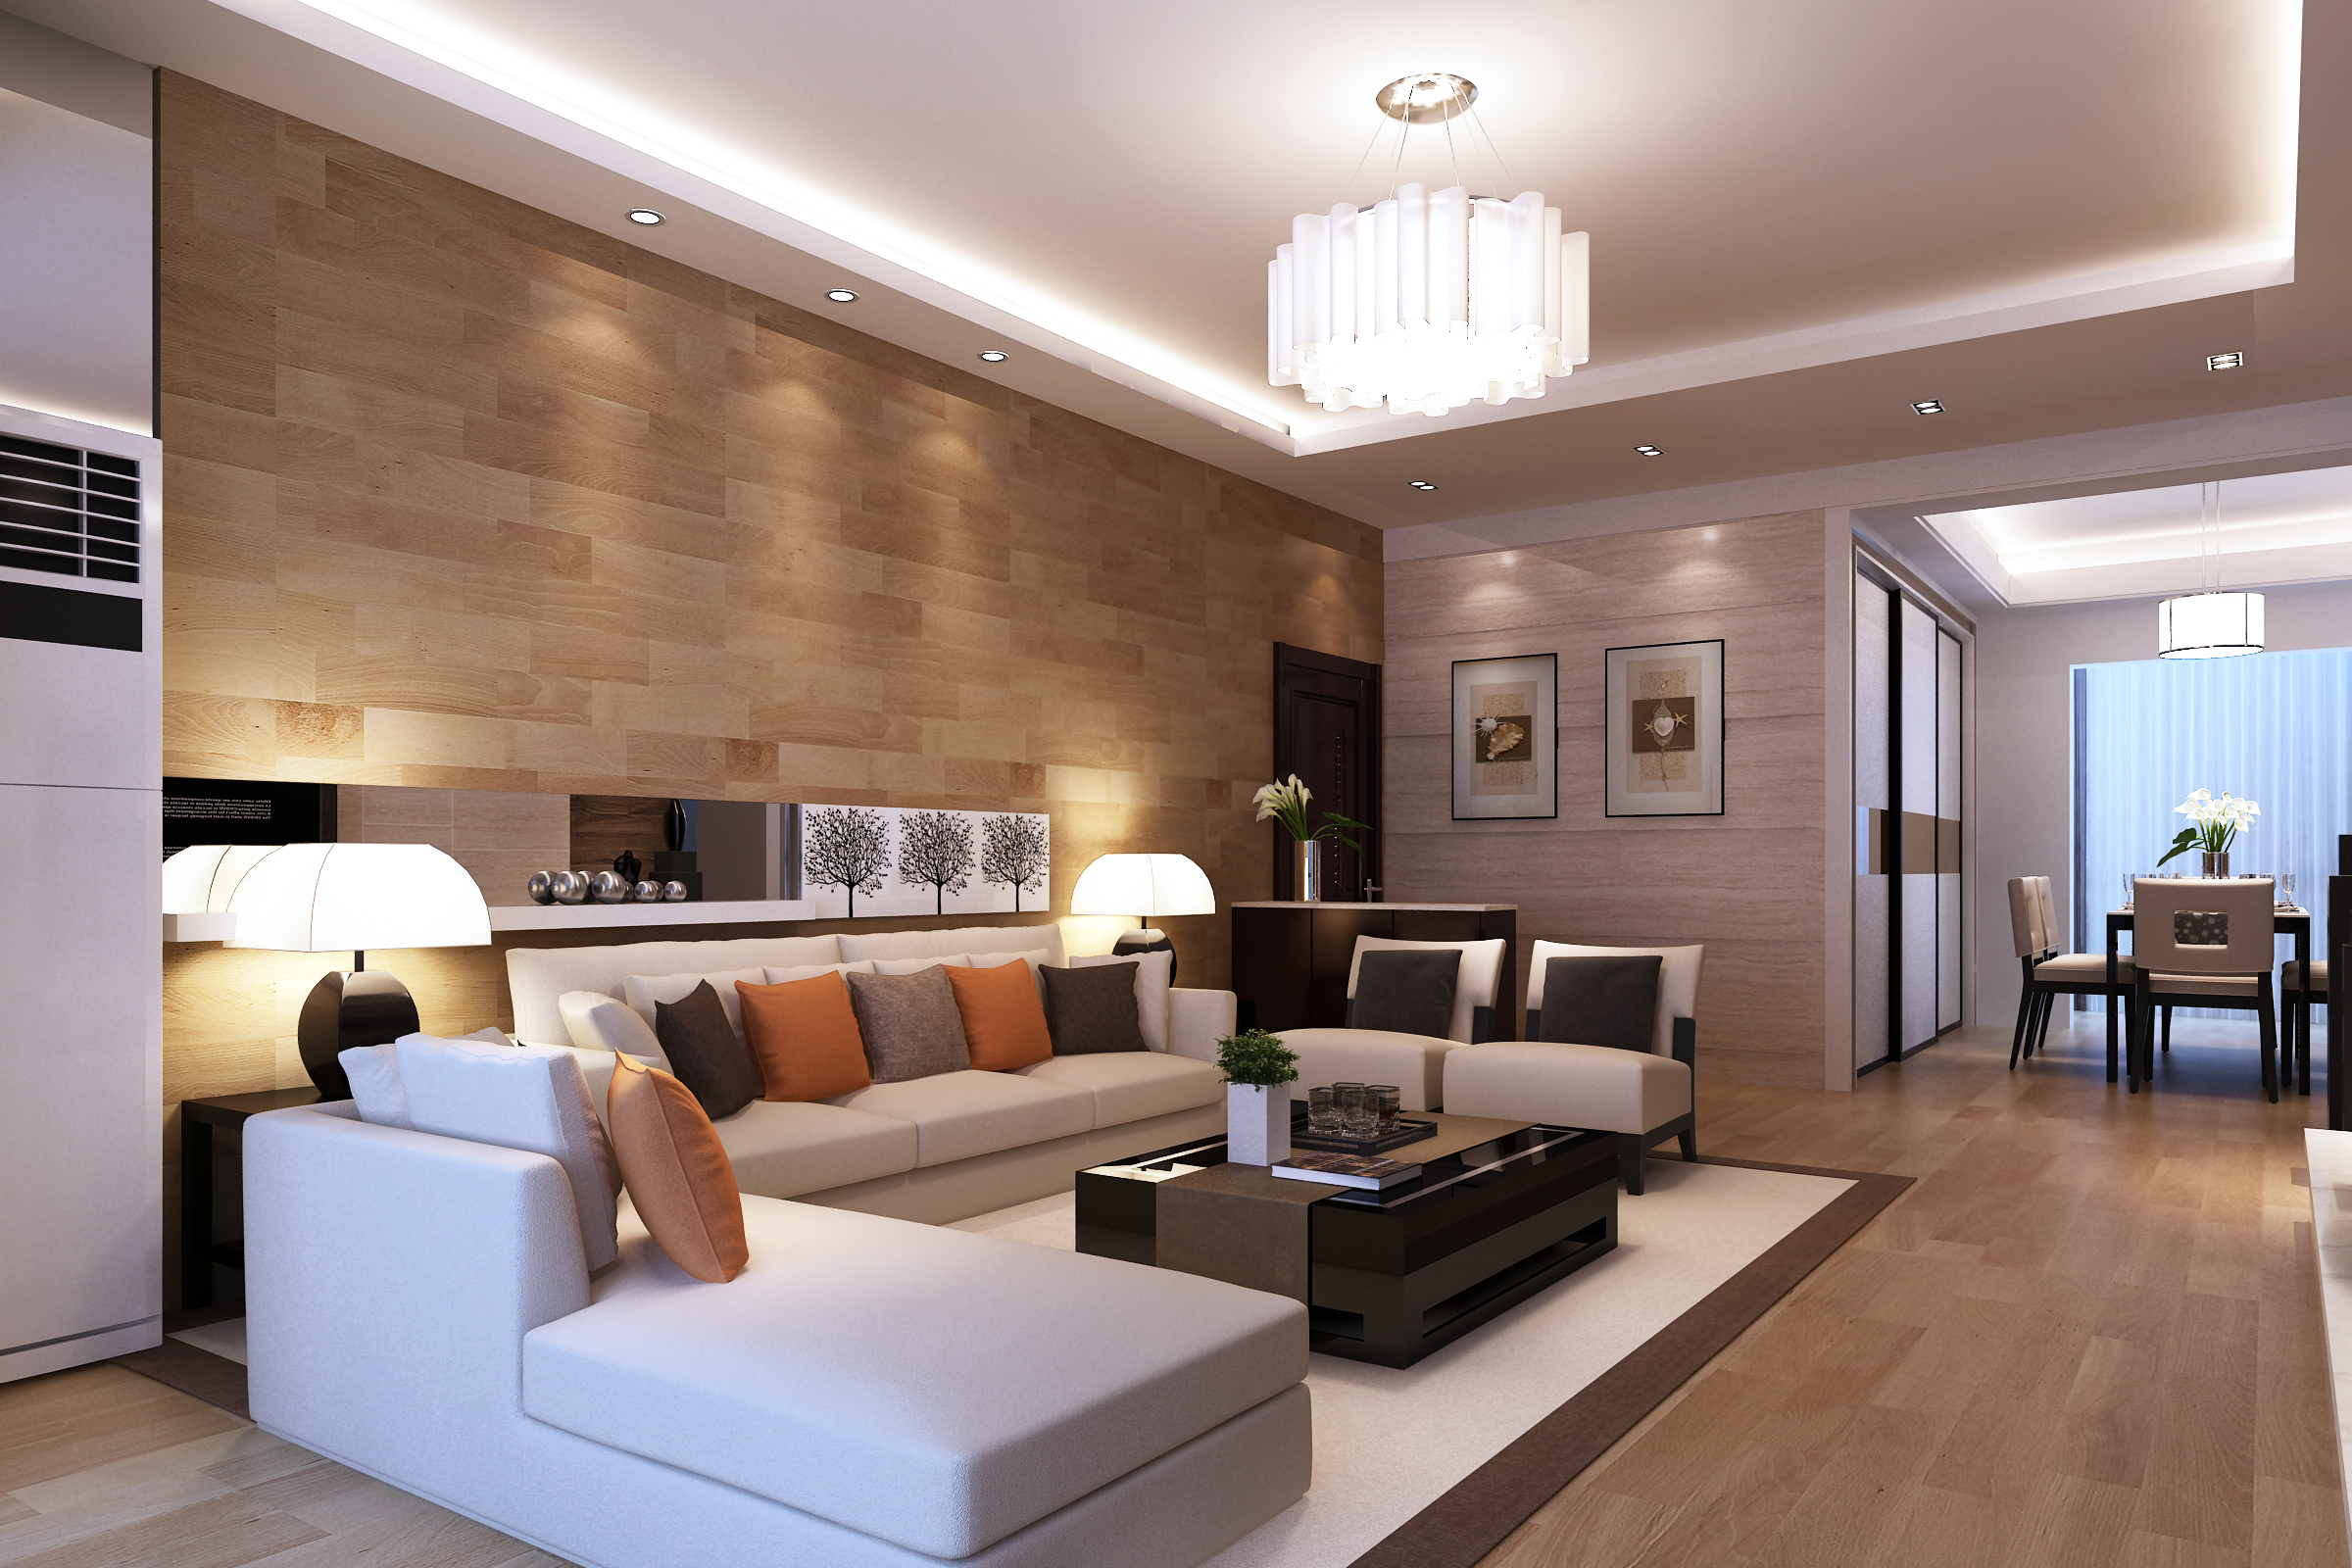 modern living room ideas good looking modern living room decor ideas 4 contemporary amazing 6 EFWOFRY